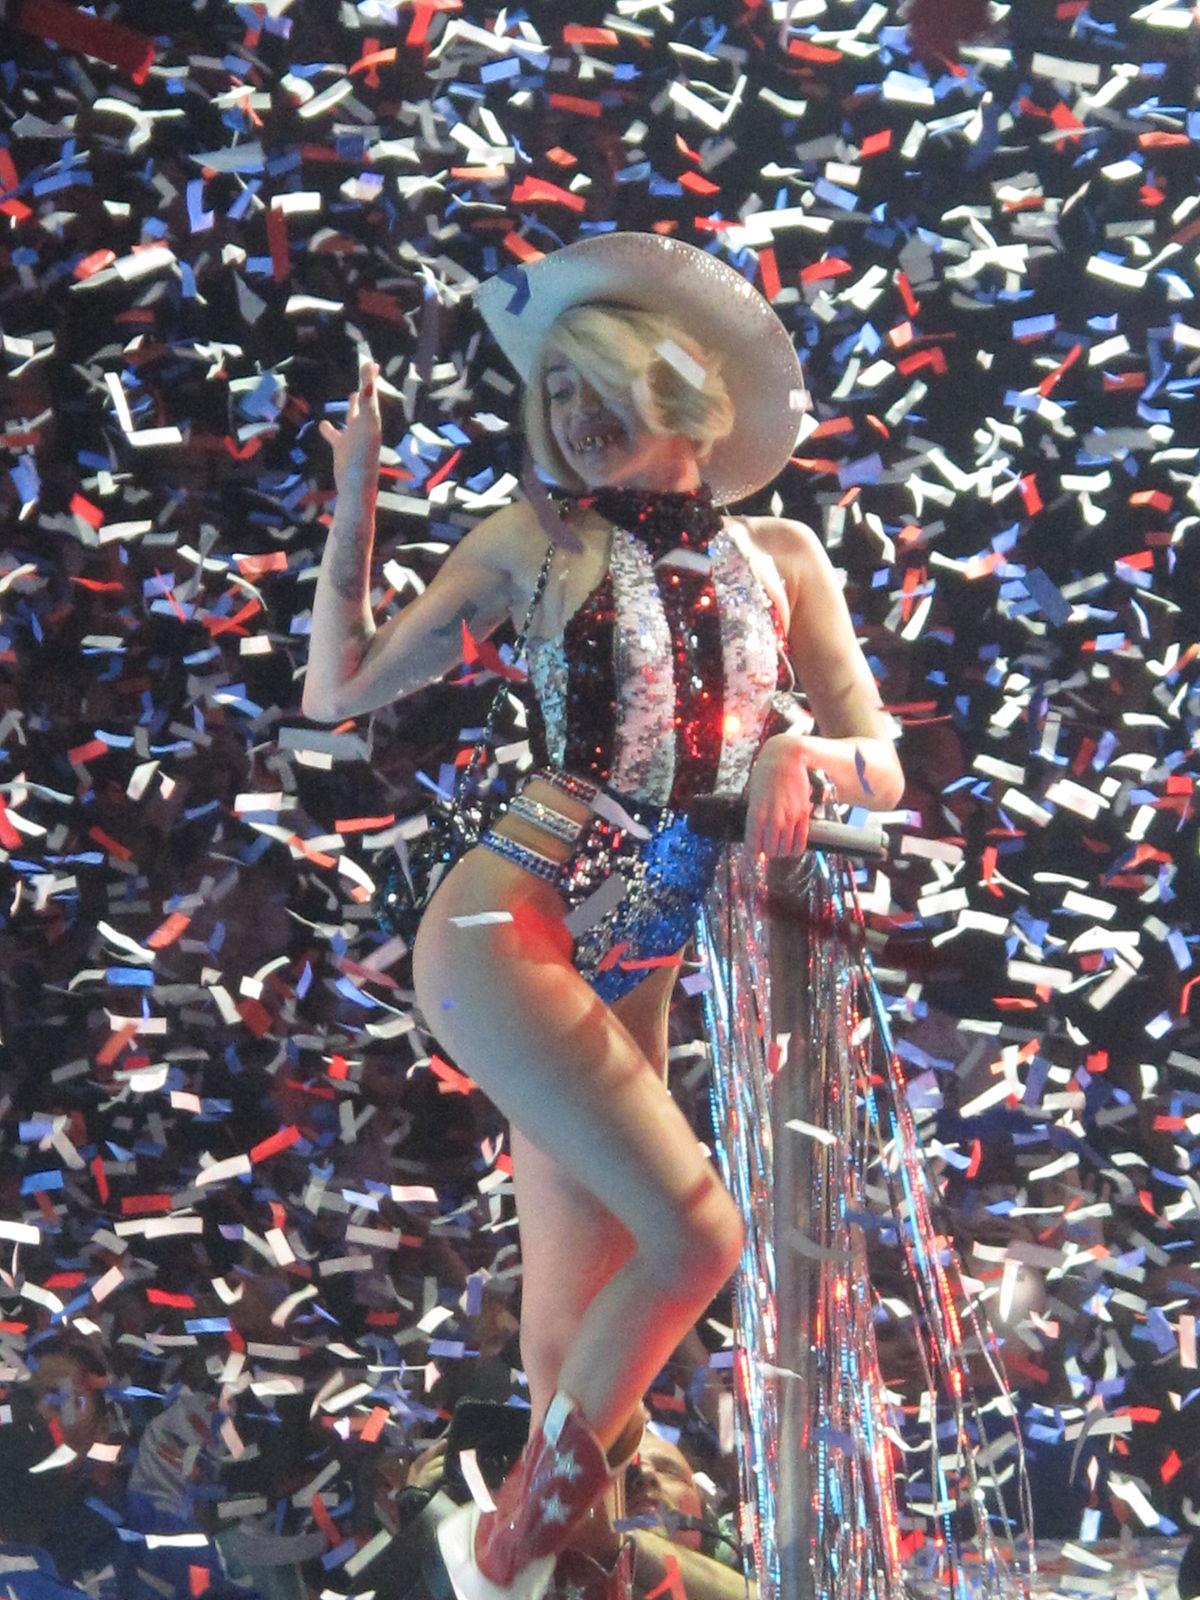 Miley cyrus bangerz tour in tac ass show - 3 4